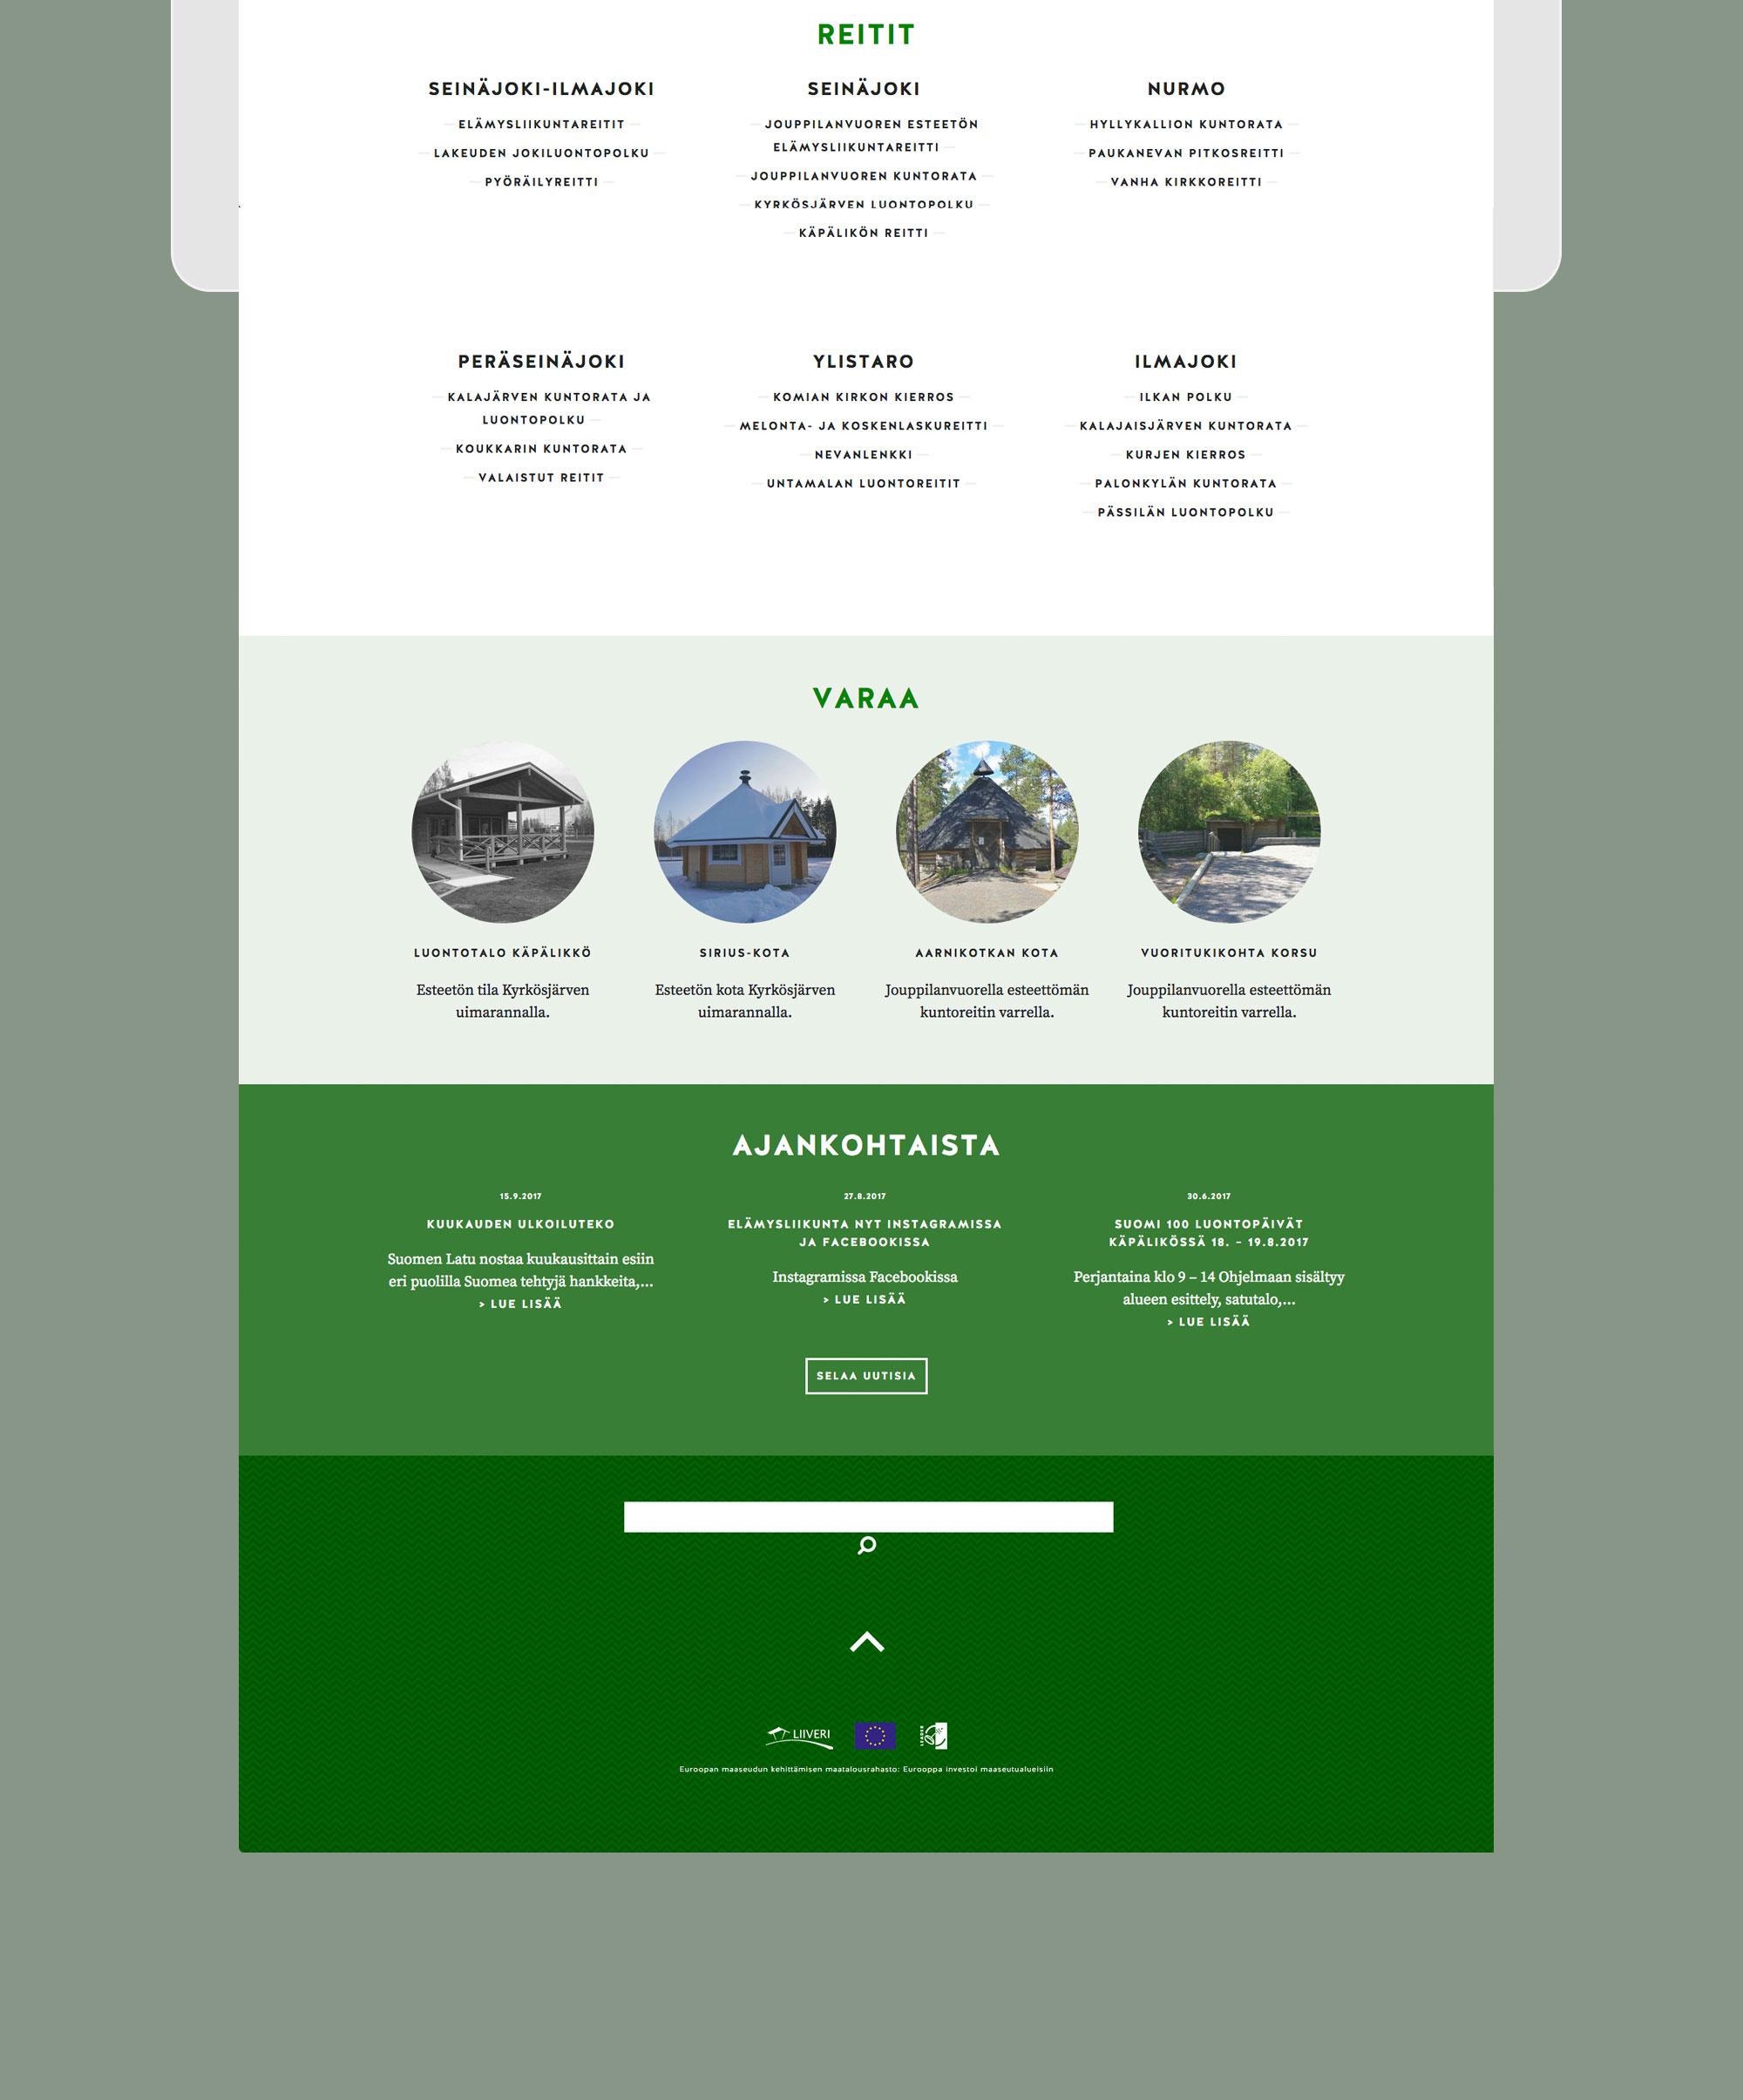 Lakeuden elämysliikunta: Landing Page